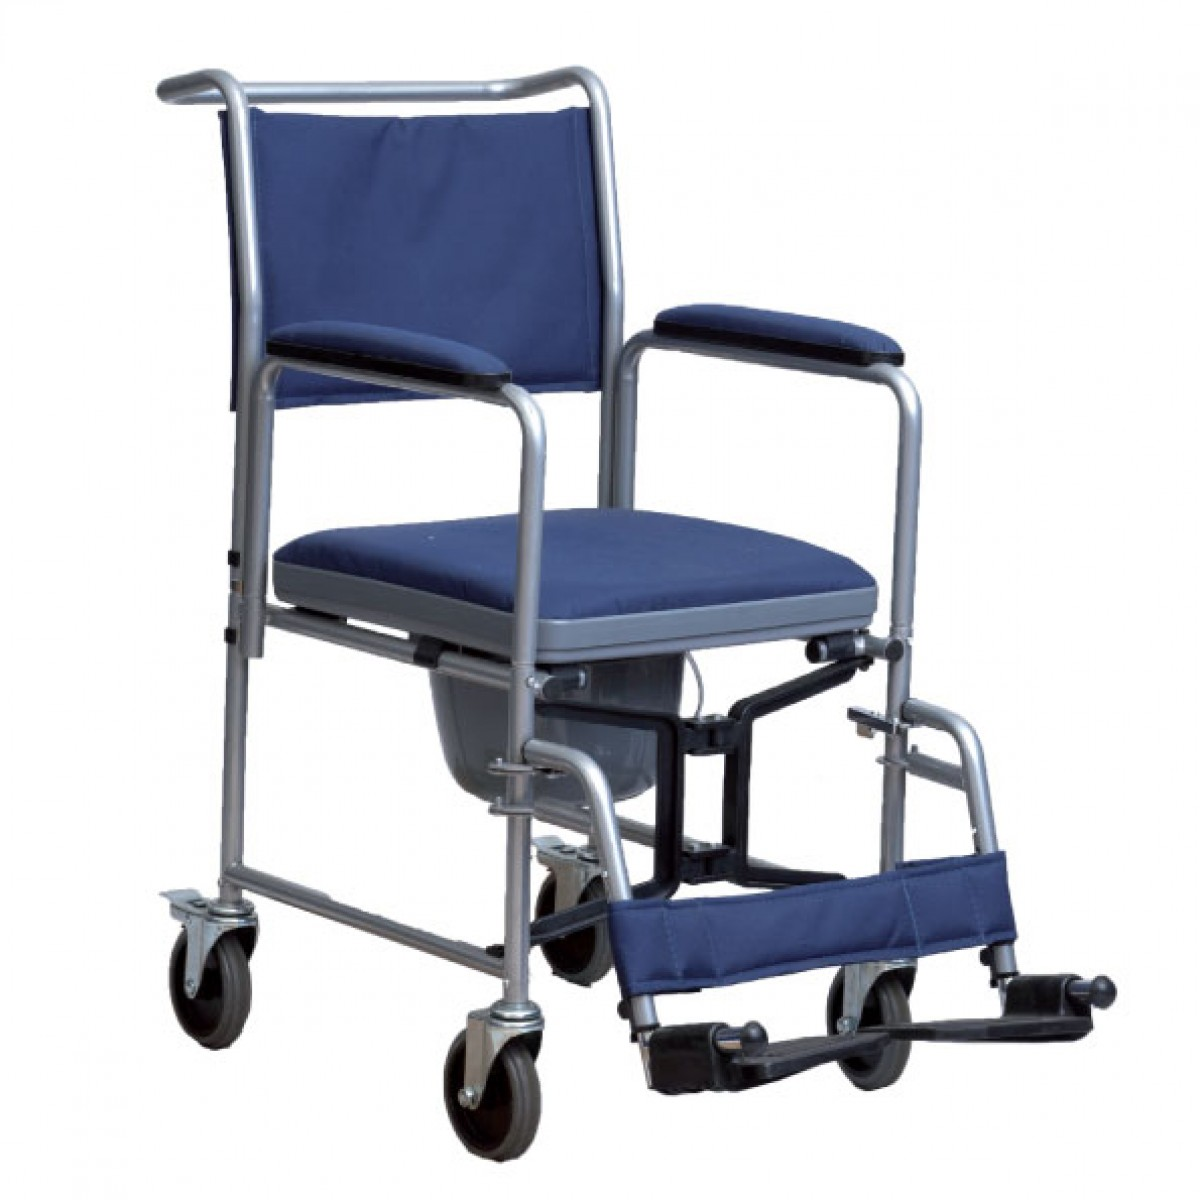 Sedia comoda con base pieghevole sedie comode for Sedia design comoda